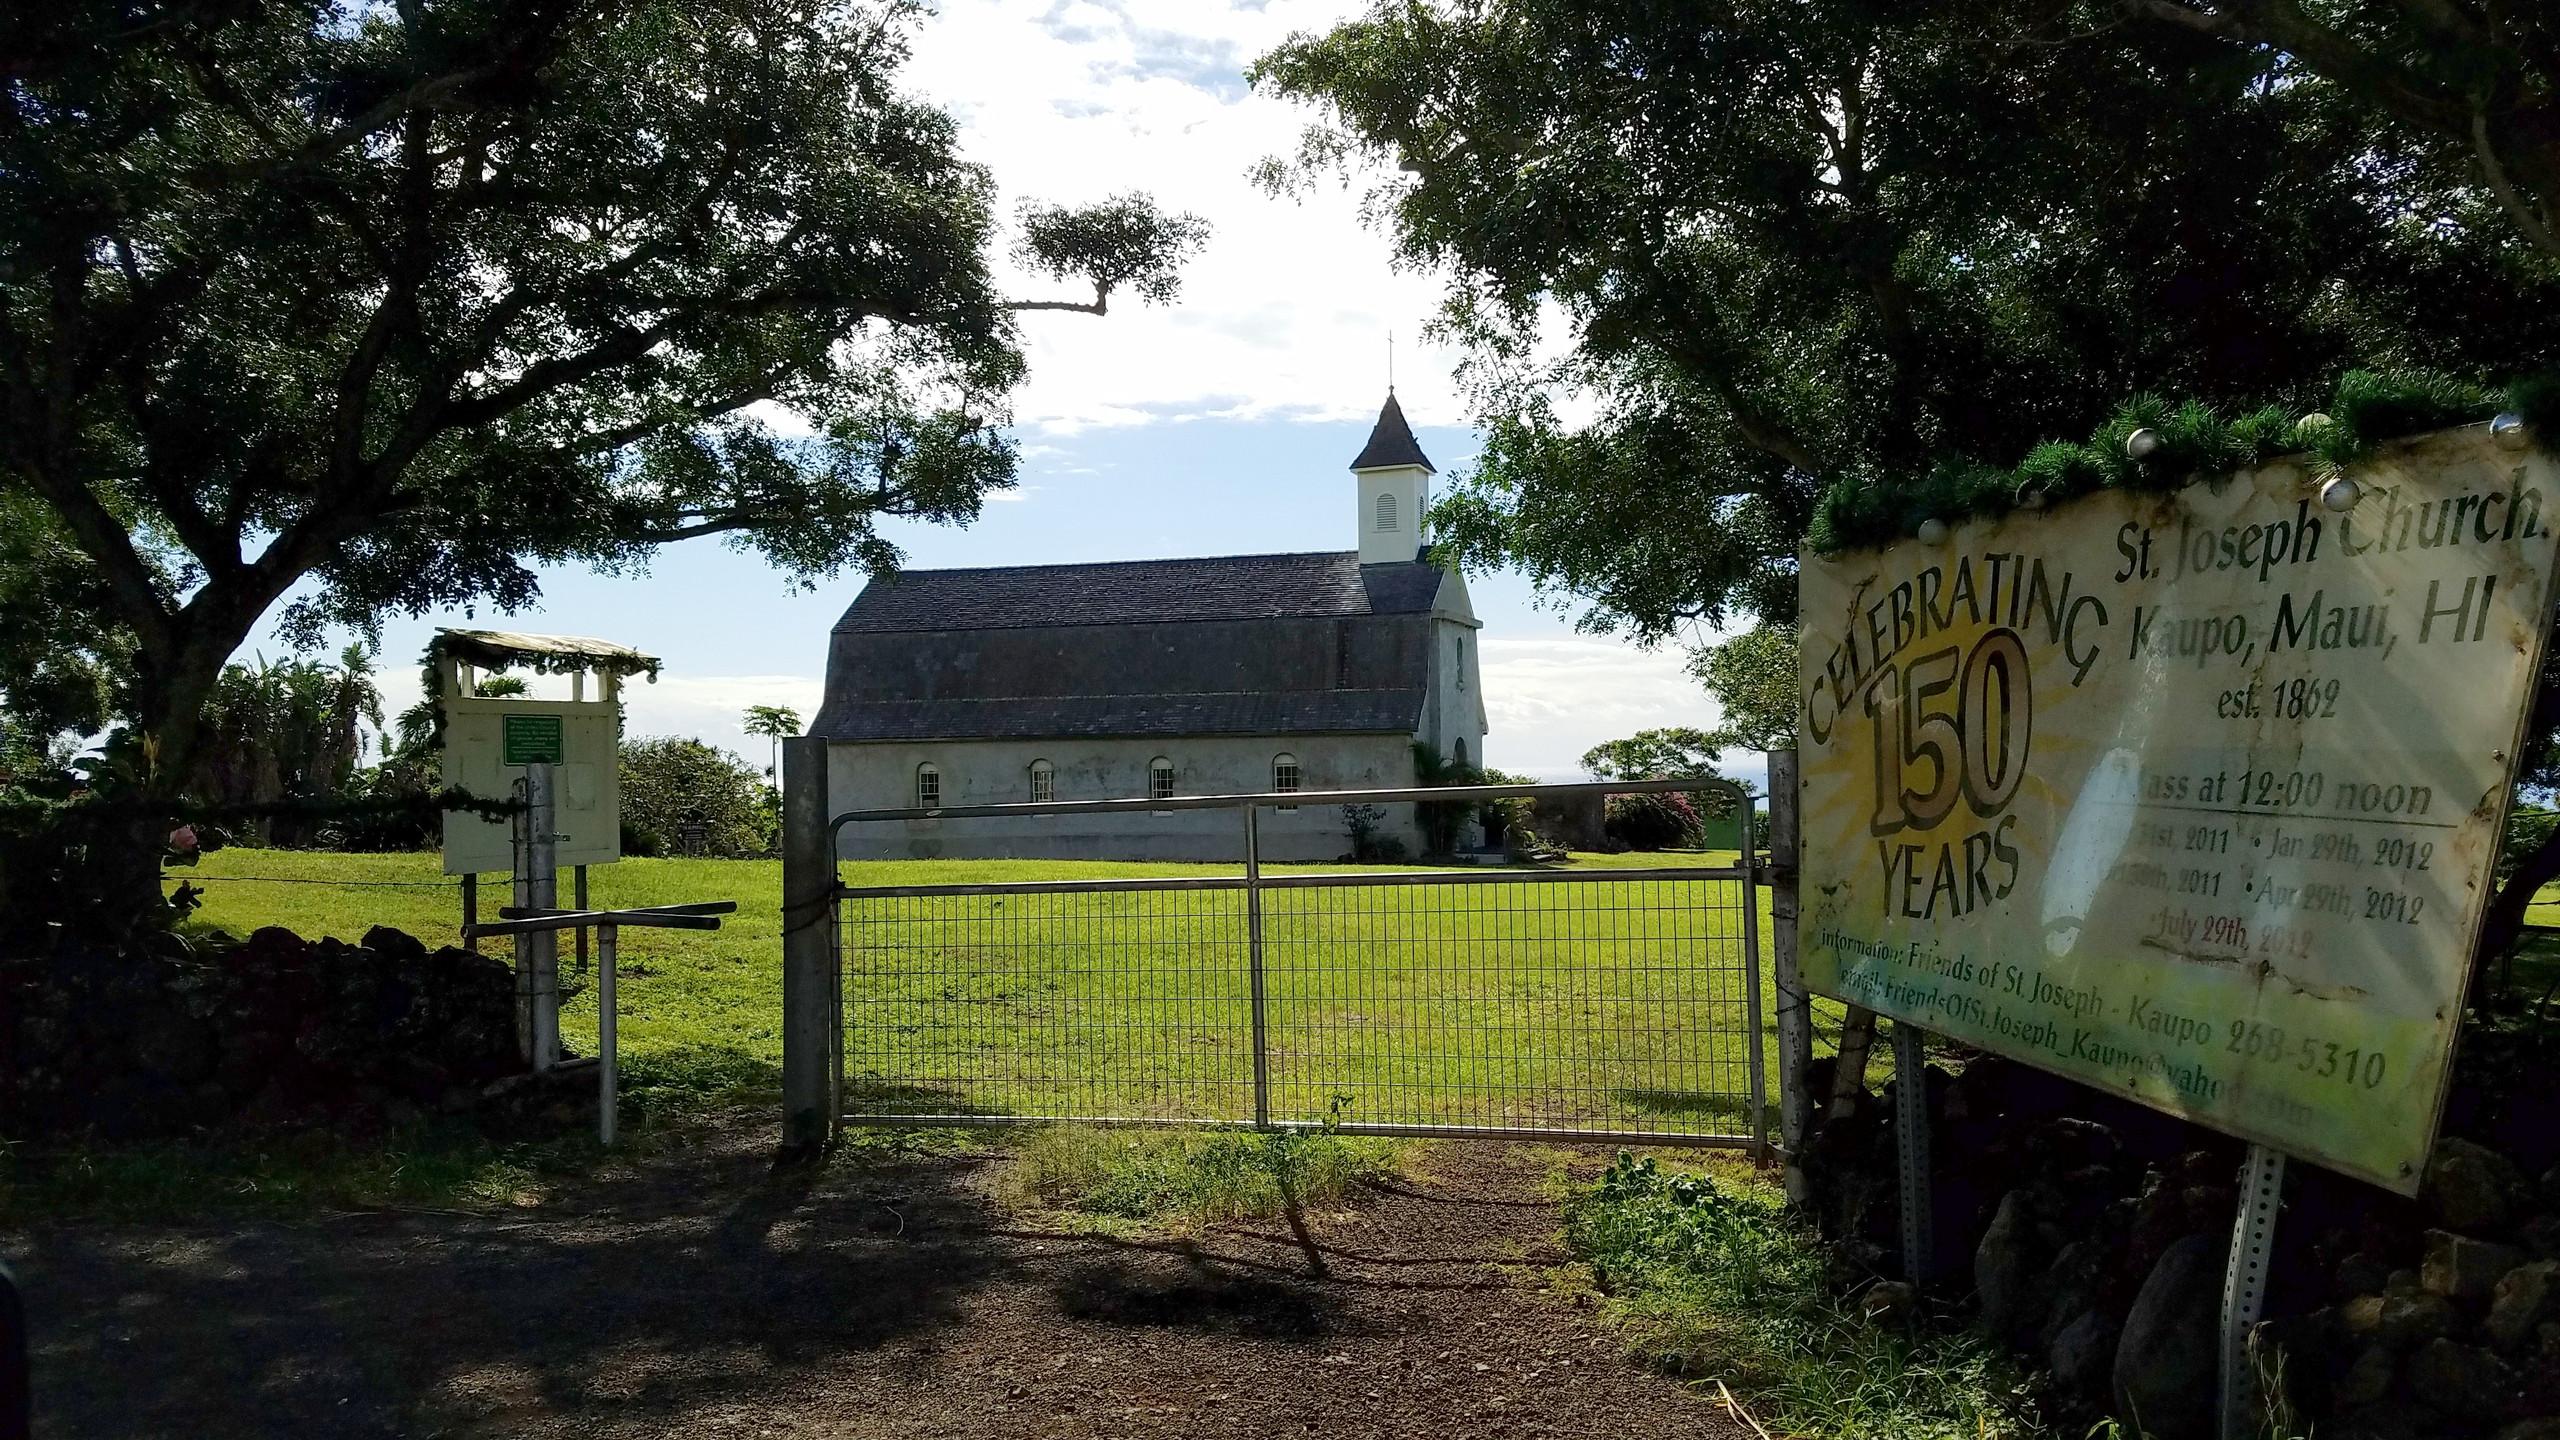 A church on the south end of Maui